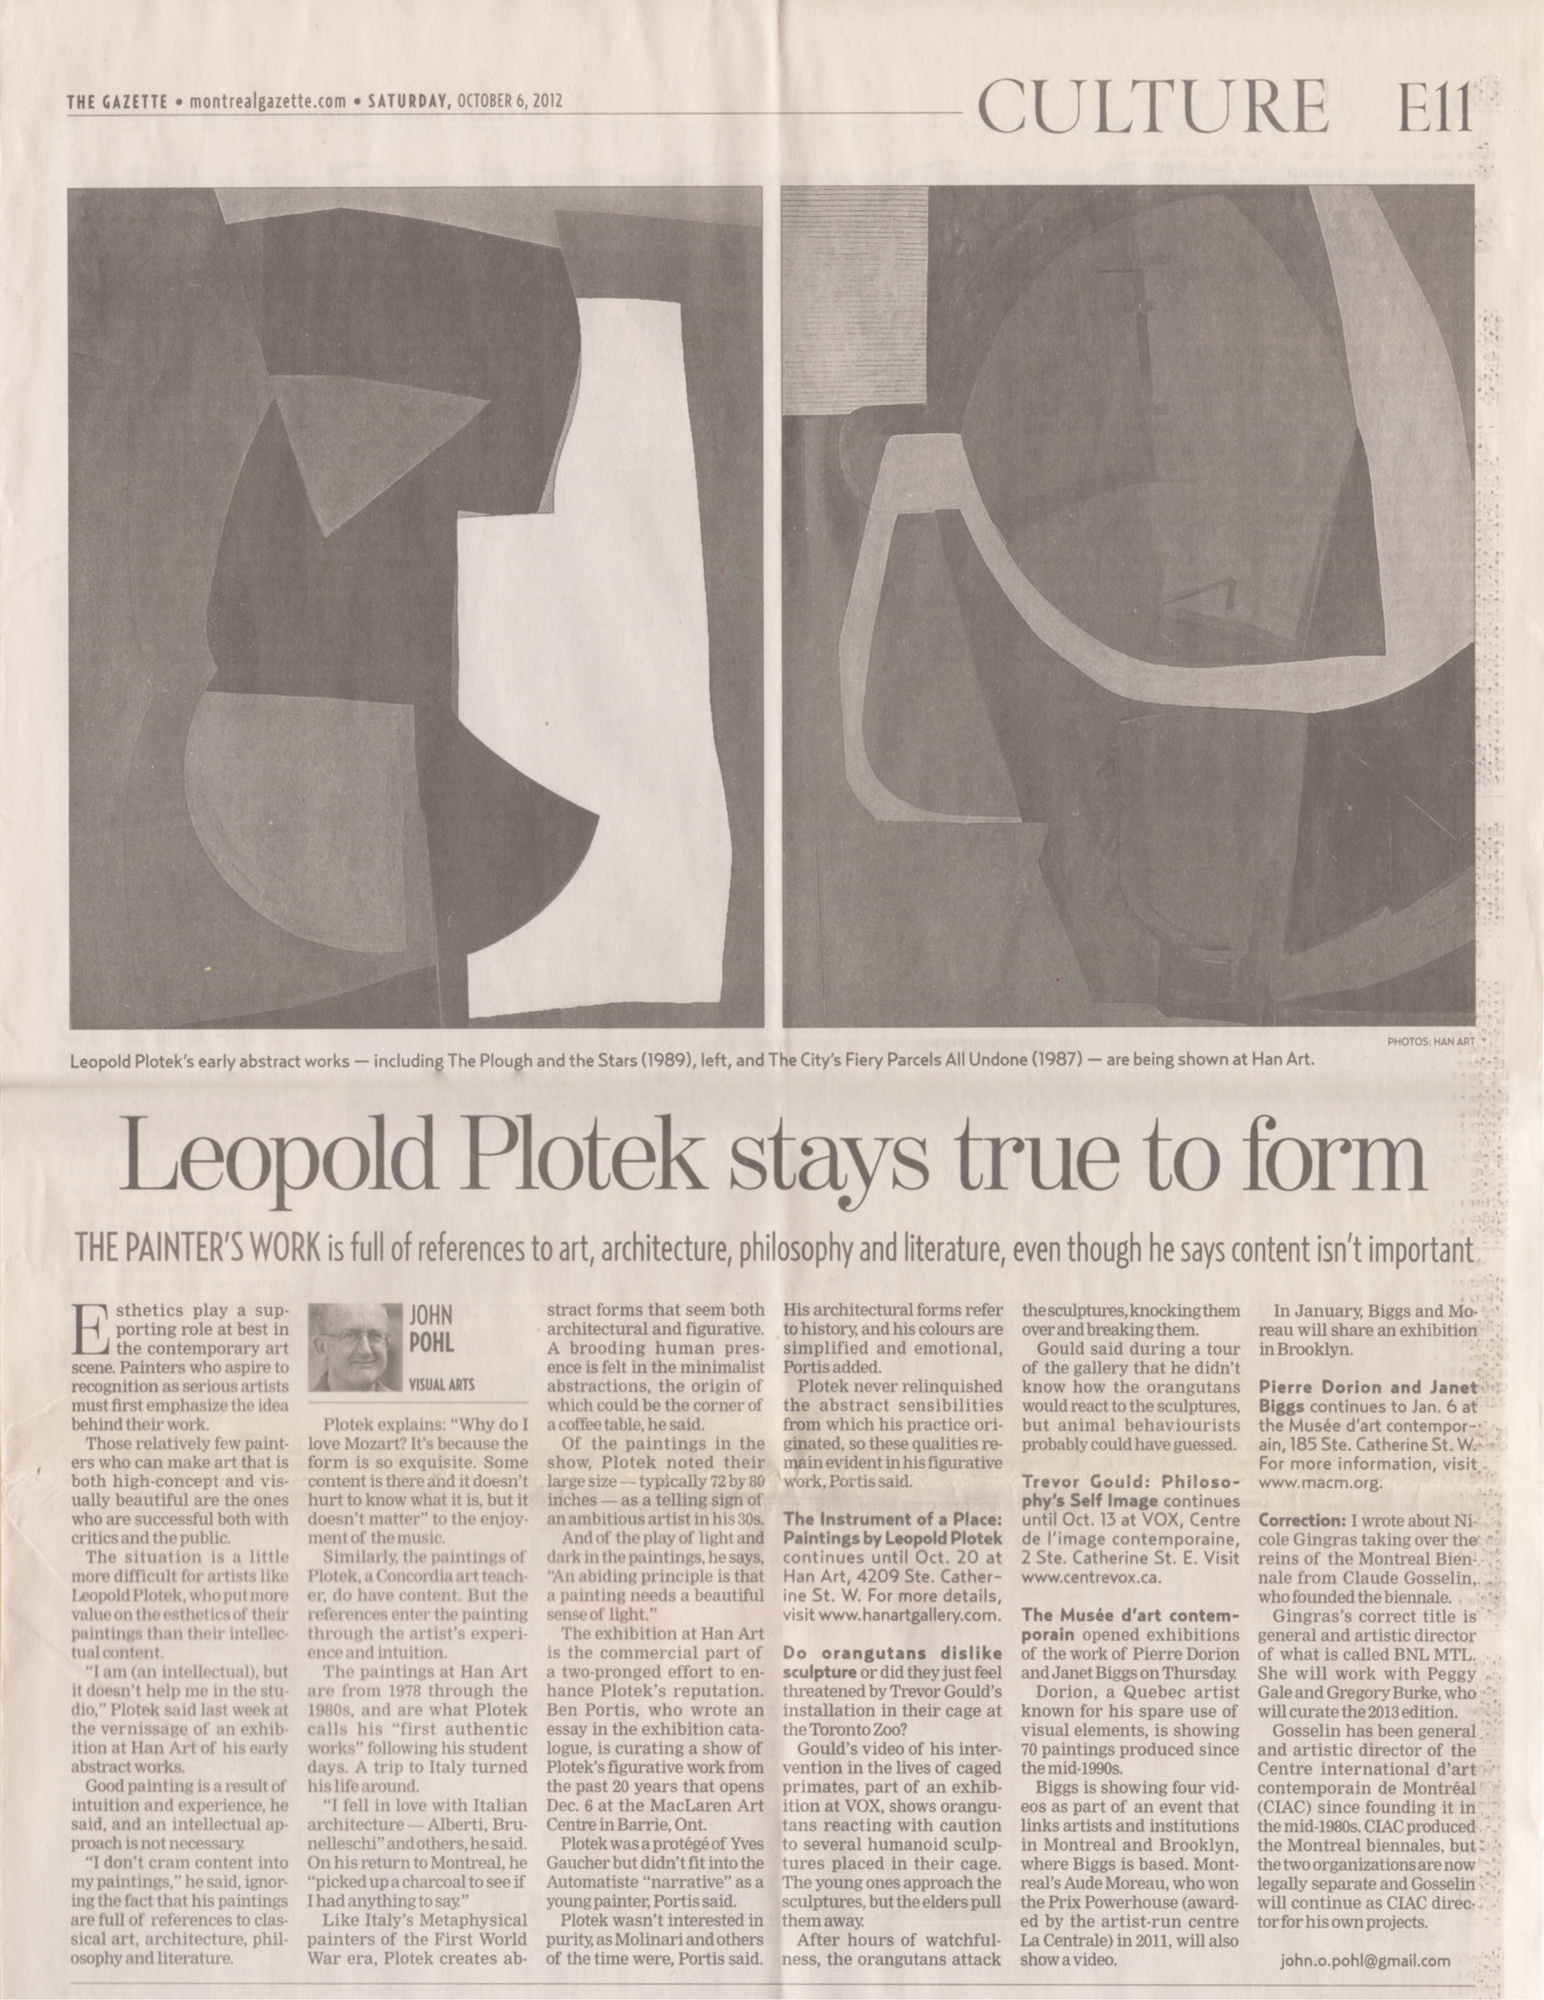 The Montreal Gazette Saturday, October 6, 2002